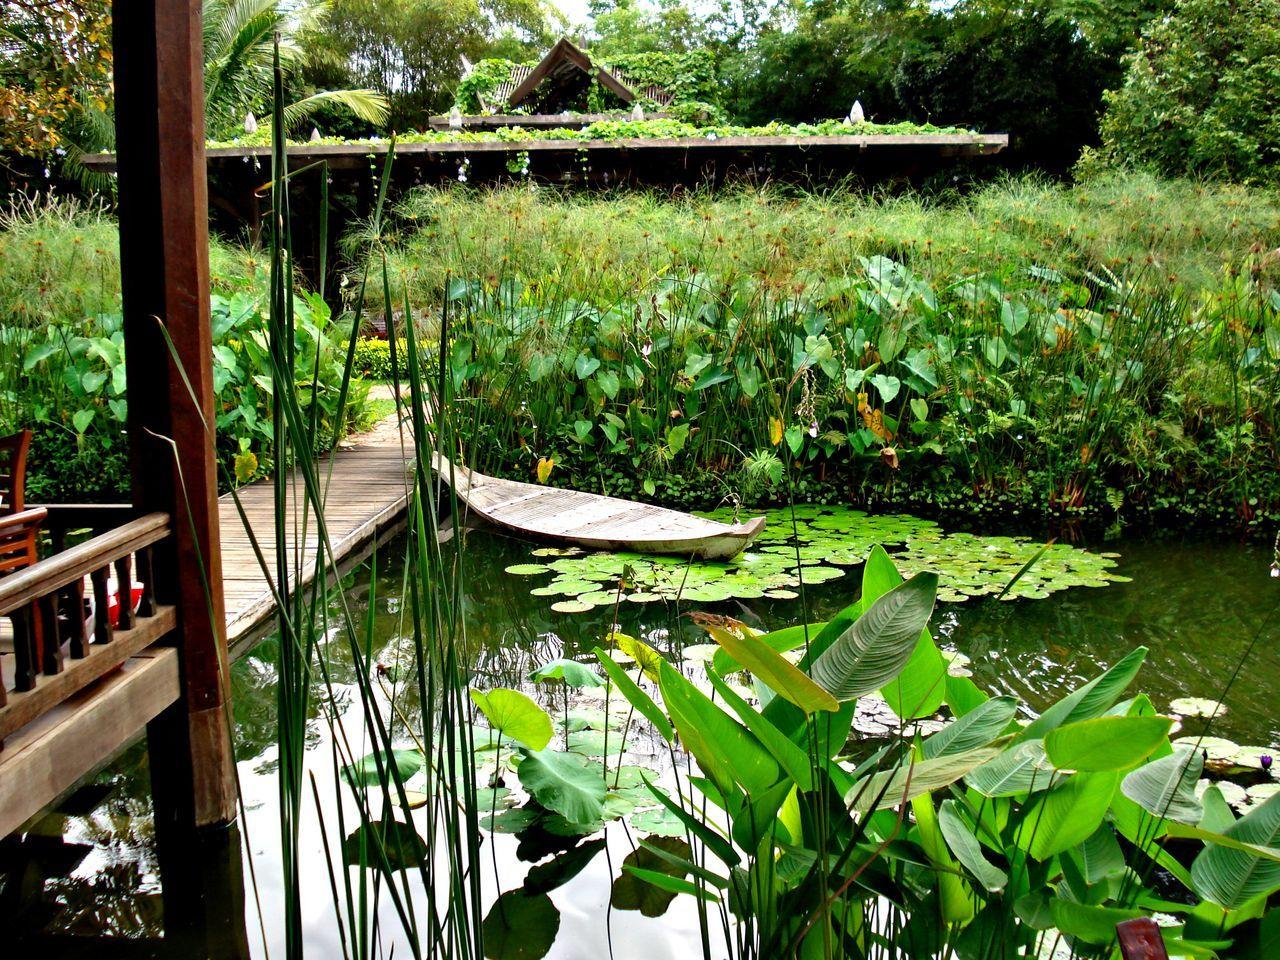 Cambodian garden ASIA Garden Garden Architecture Flowers Plants Bamboo Water Boat Decoration Green Nature Zen Garden Building